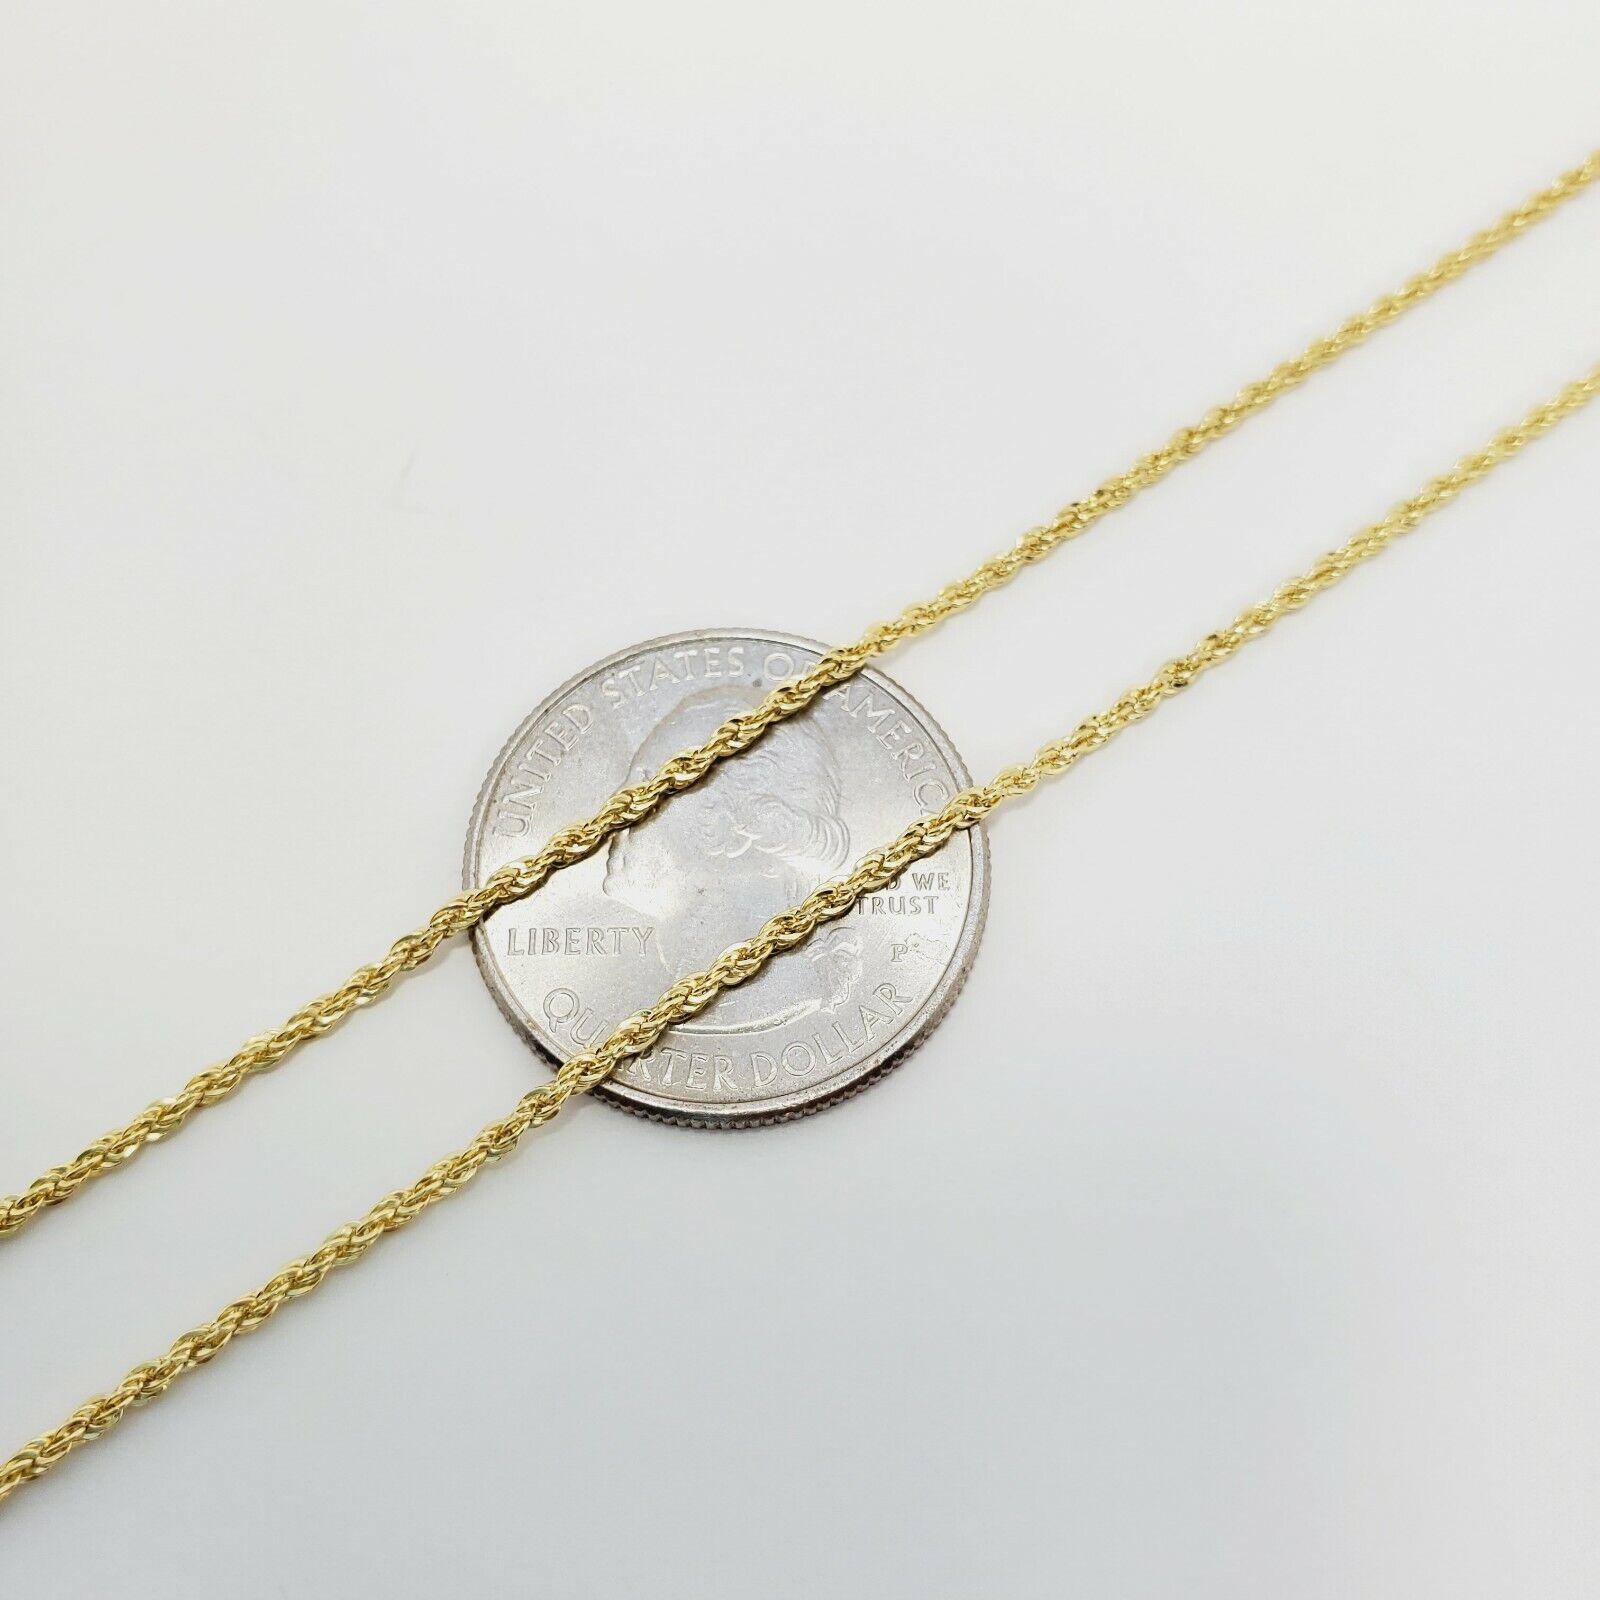 "10K Yellow Gold 1.5mm Diamond Cut Rope Chain Pendant Necklace Mens Women 16""-26"" 7"